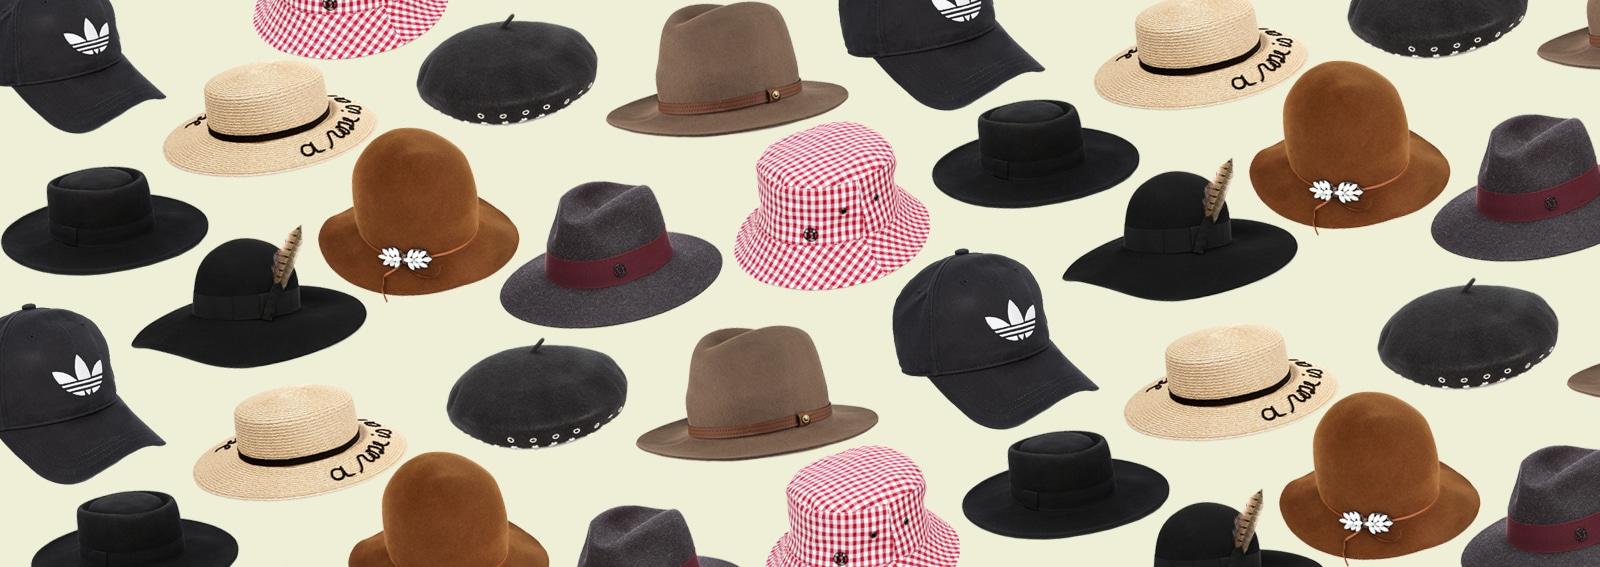 cover 10 cappelli must have desktop